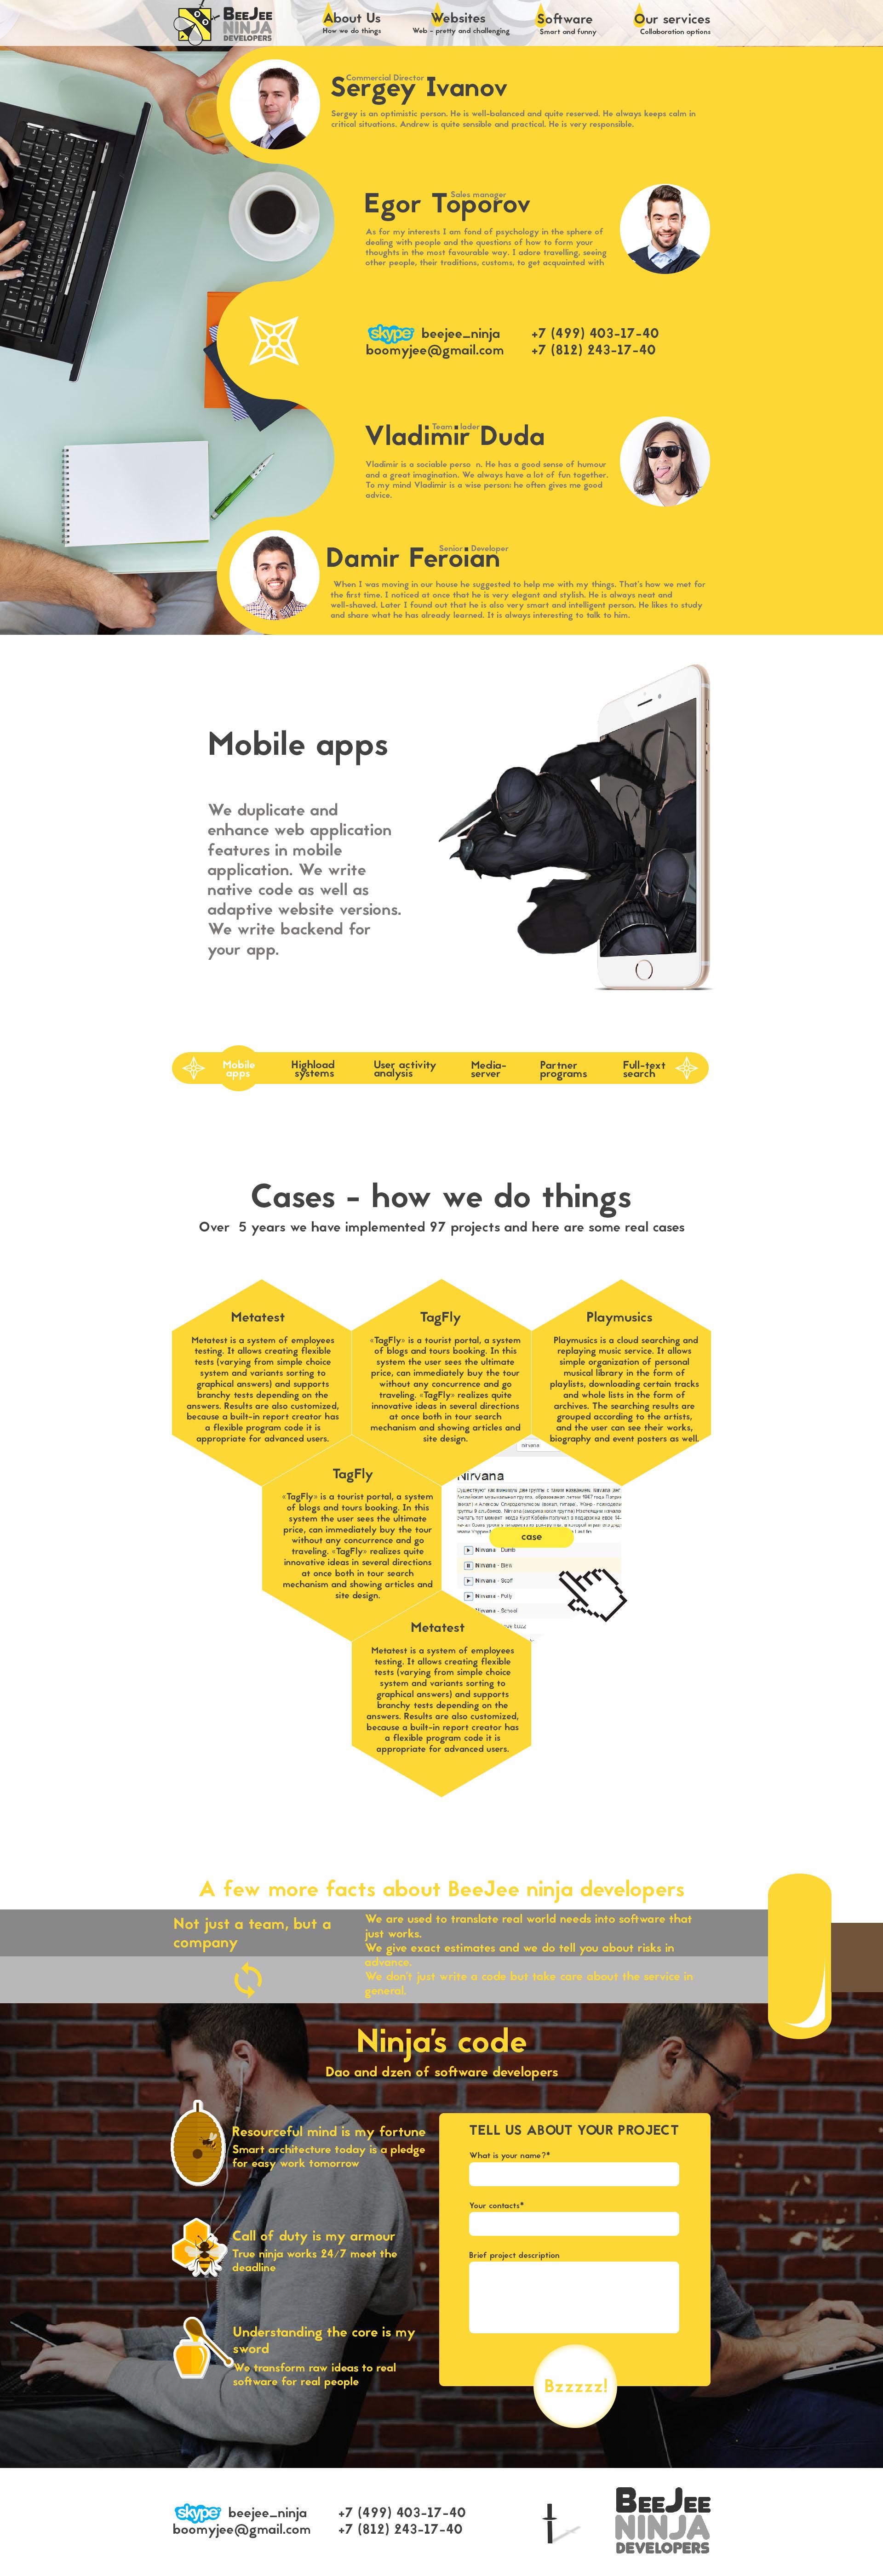 Концепт дизайна сайта в корпоративном стиле для IT компании фото f_4355958f35ea1c30.jpg